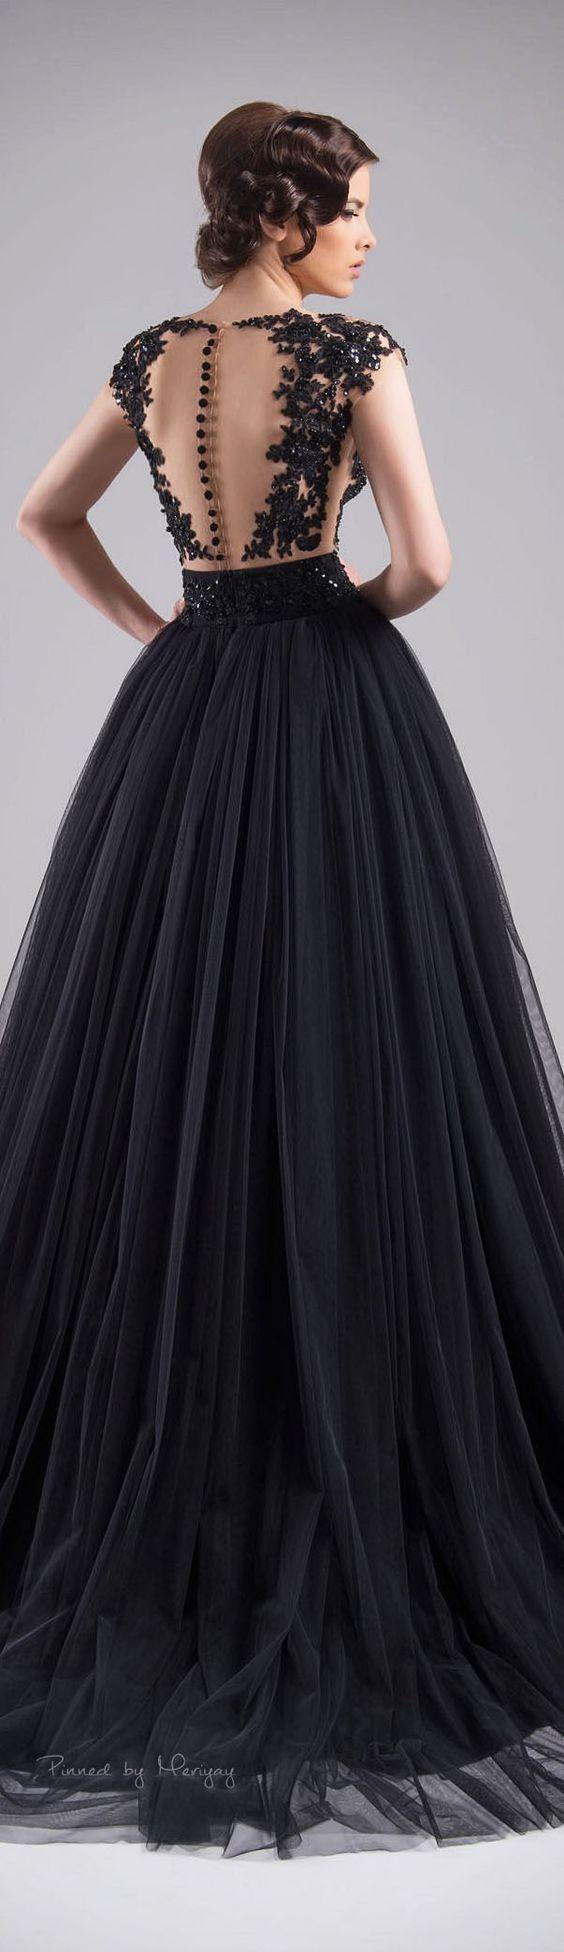 Chrystelle Atallah Spring-summer 2015 / http://www.himisspuff.com/black-wedding-dresses/4/